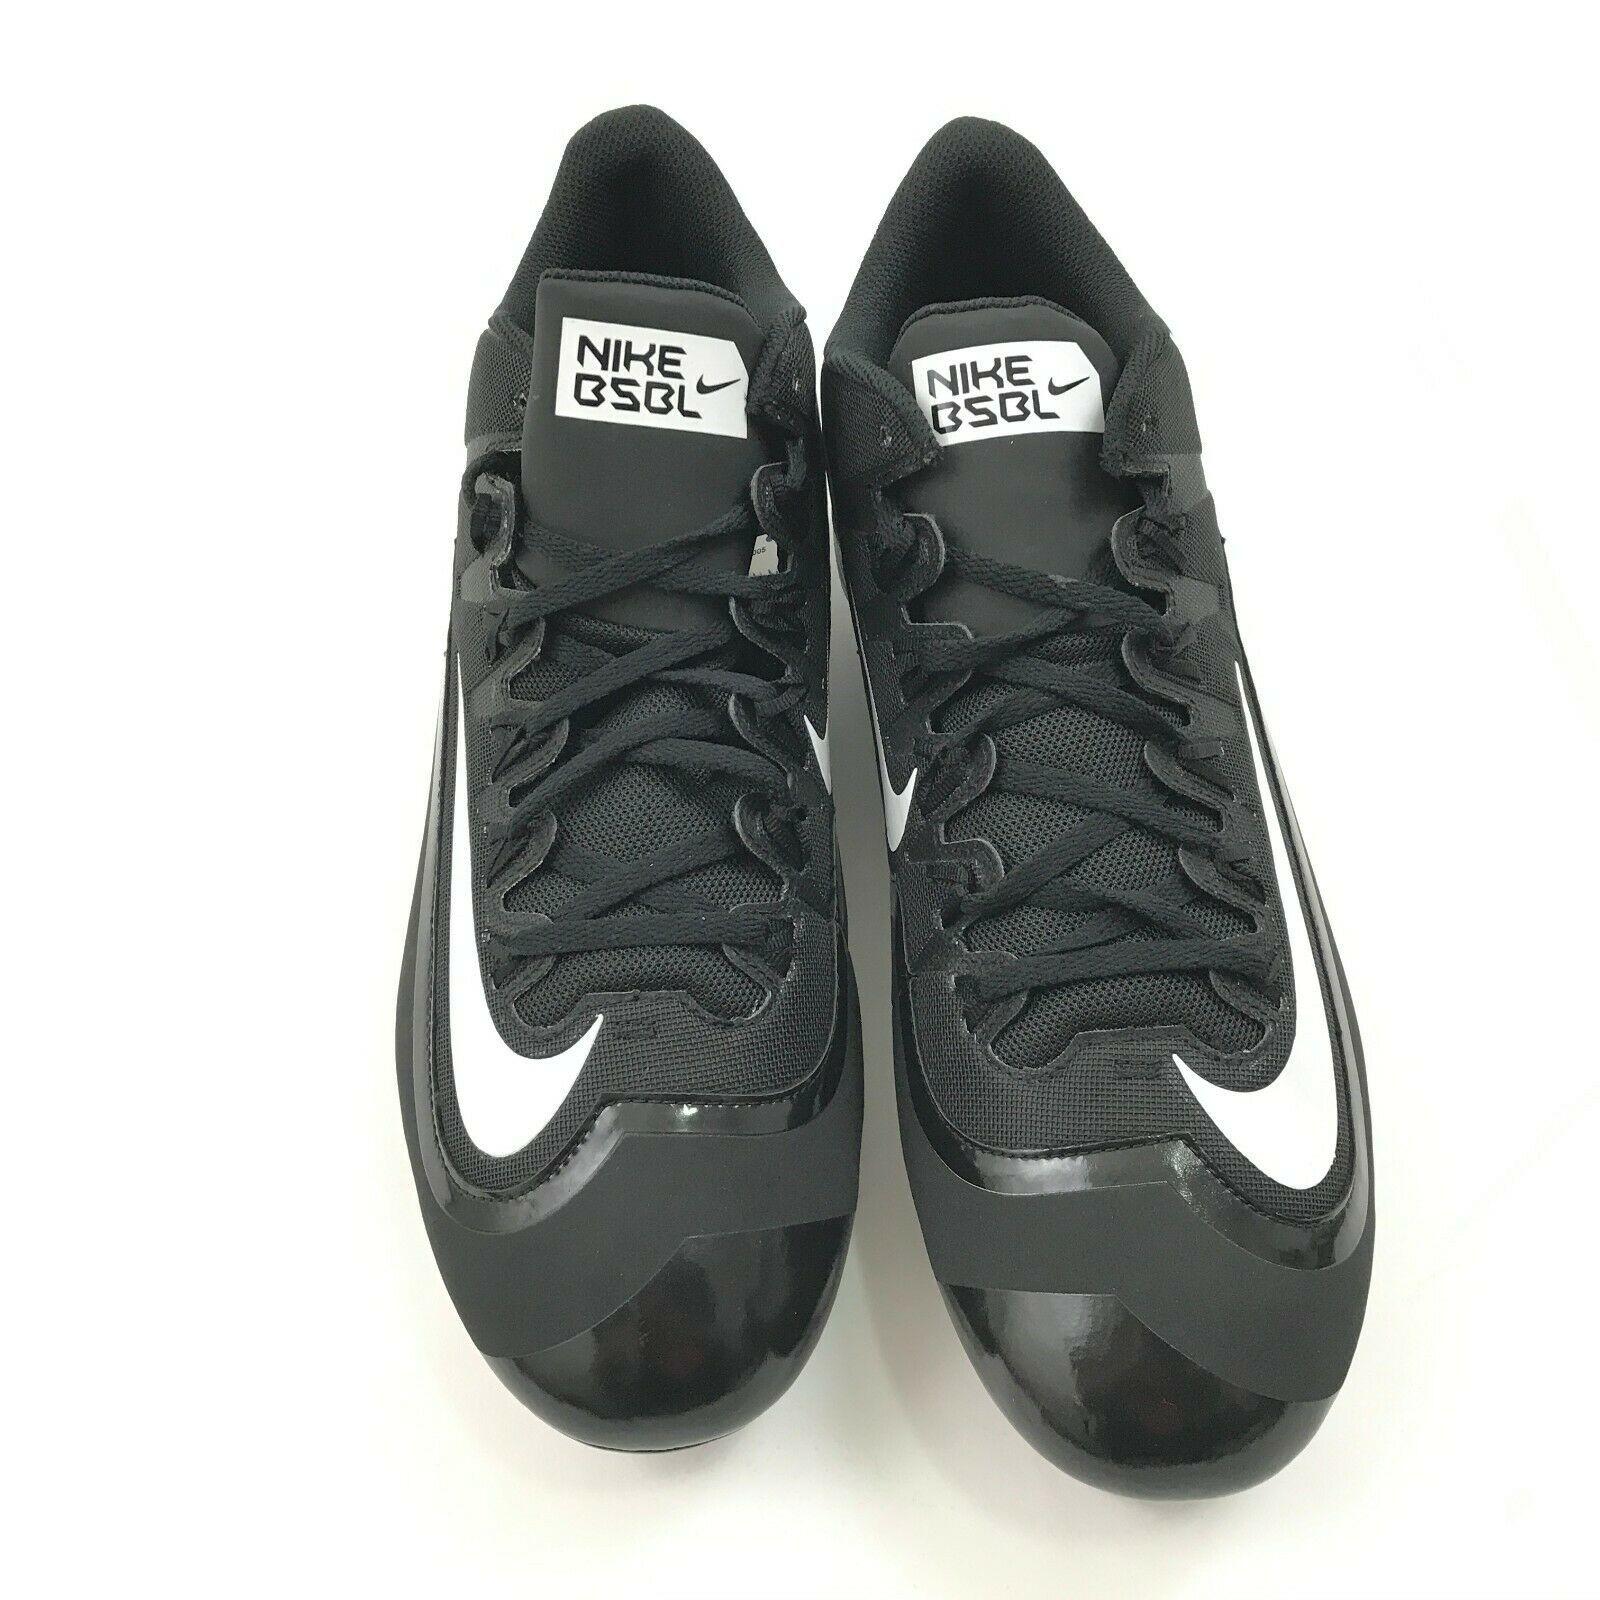 new product 2a1f4 42e71 Nouveau Nike pour Homme Huarache 2KFilth Pro mi Baseball Crampons Size 15